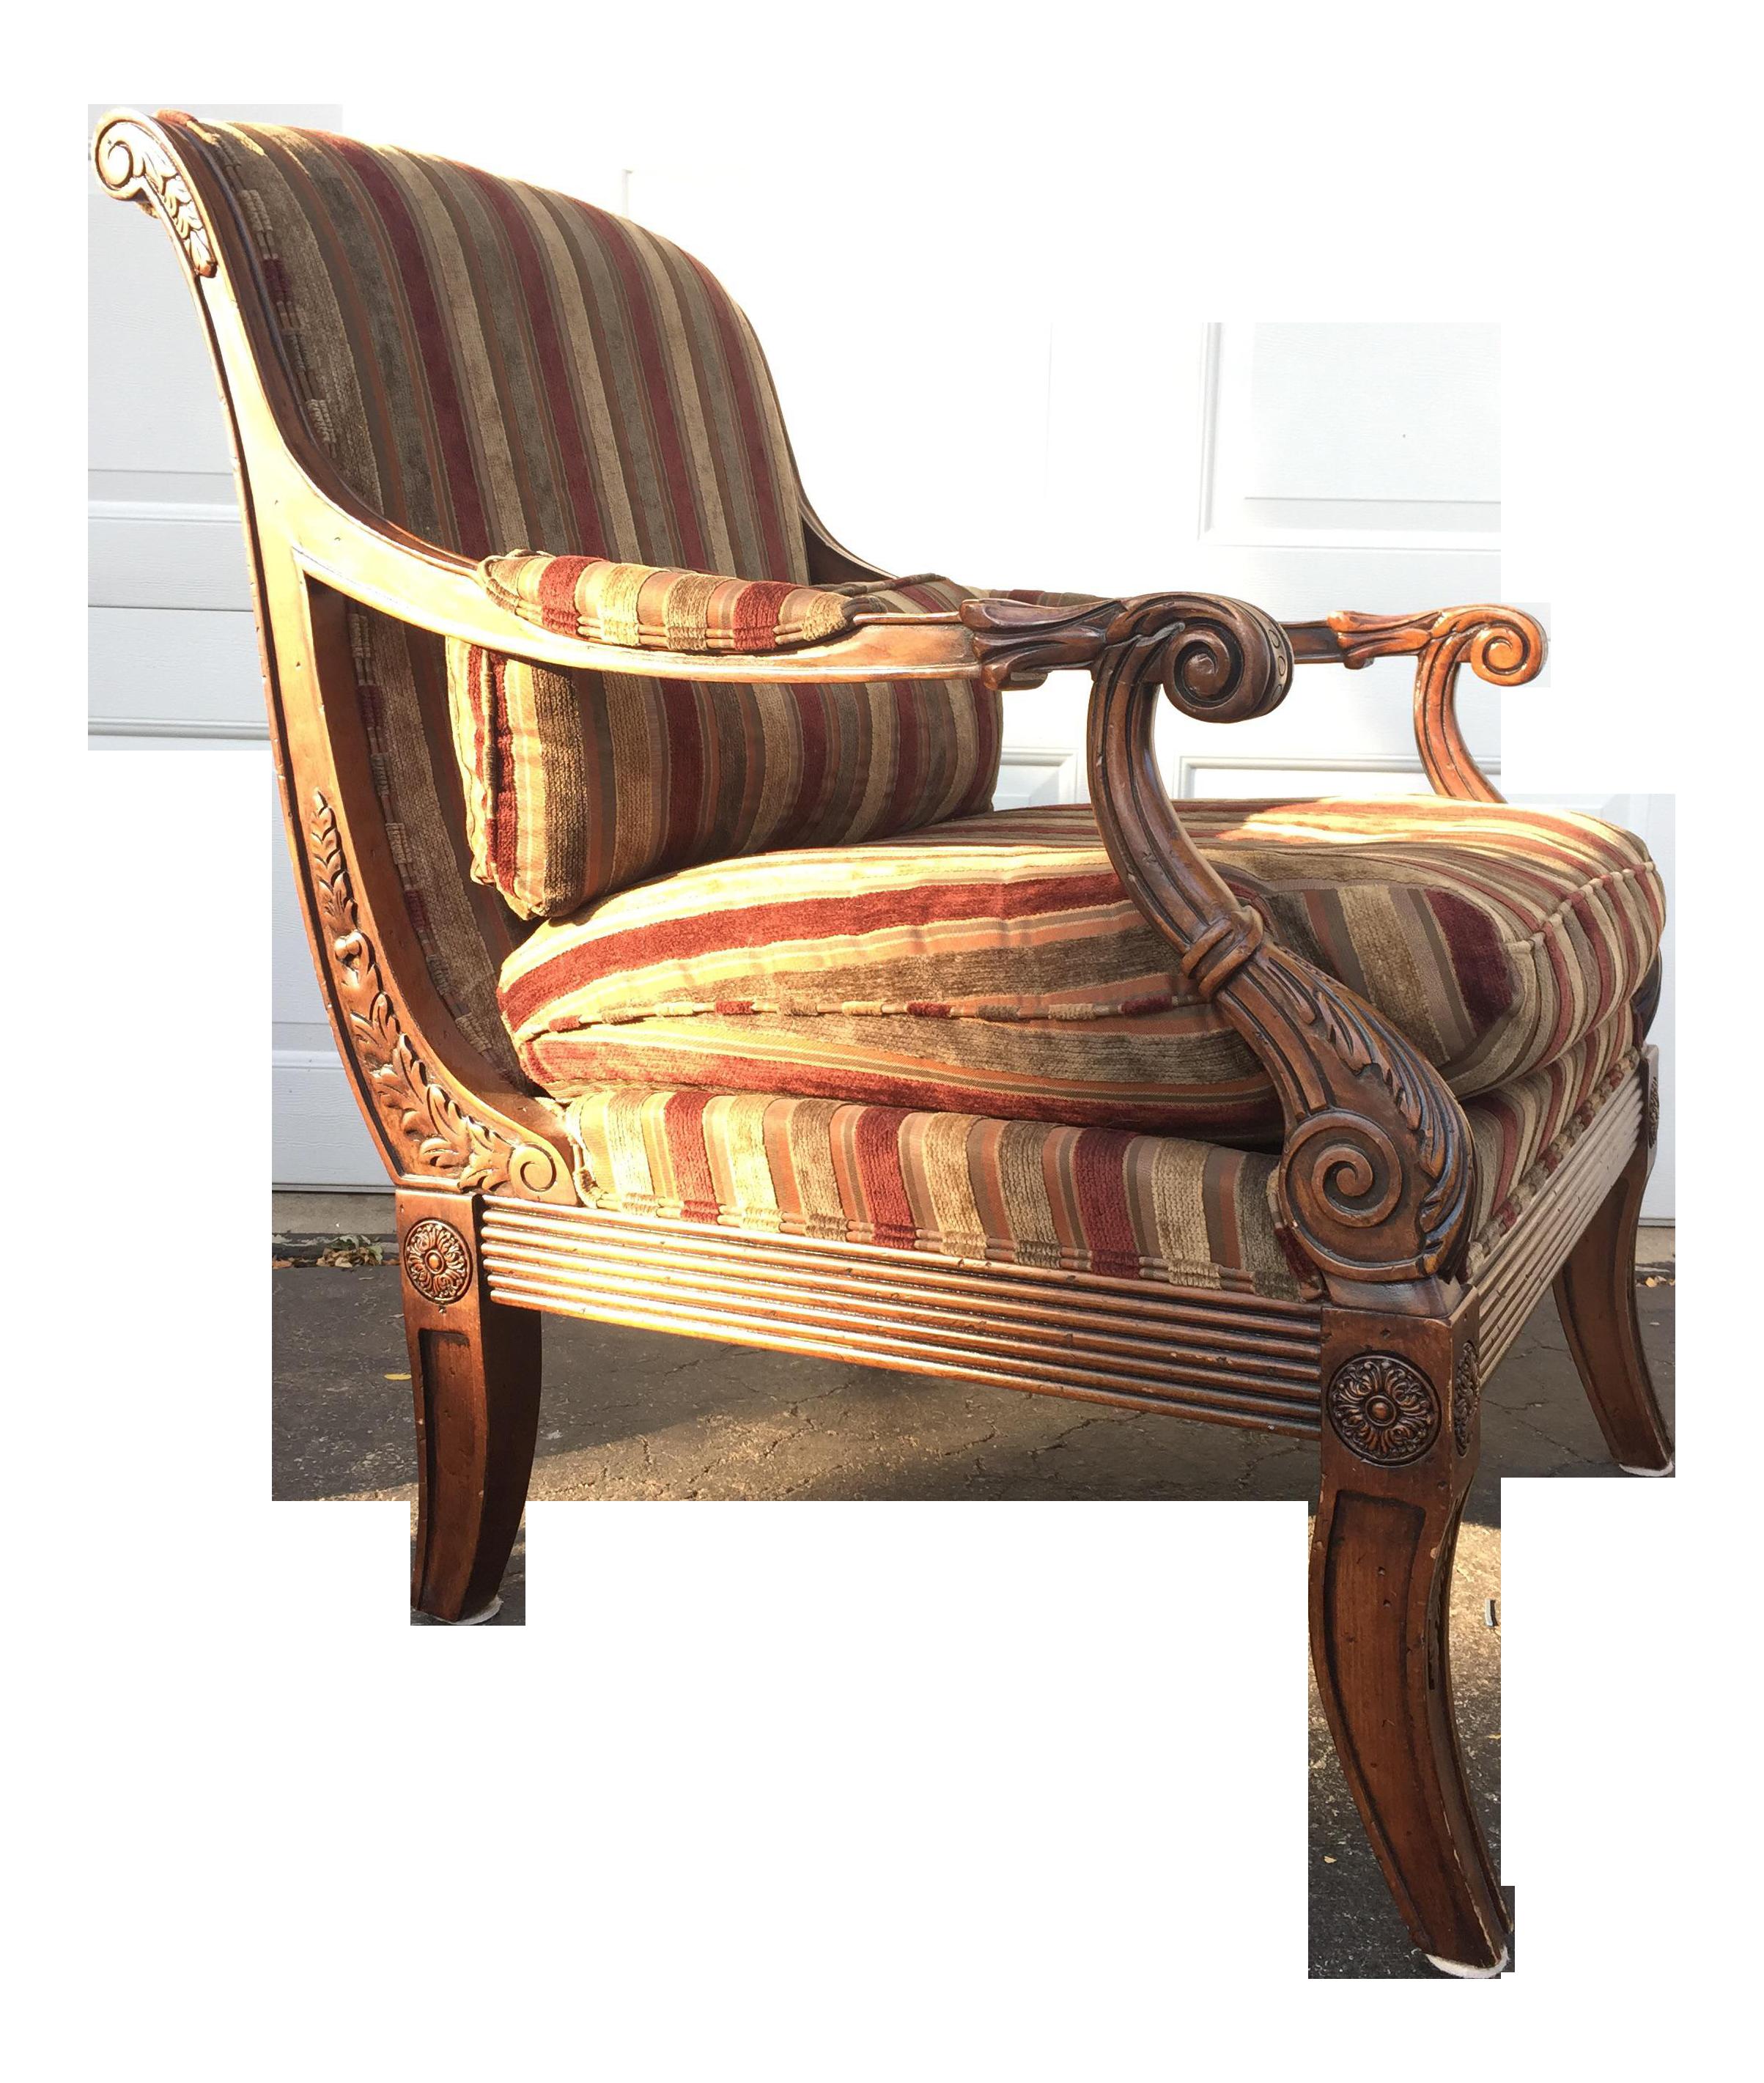 Ethan Allen Wicker Chair Images Grady Cane Back Side